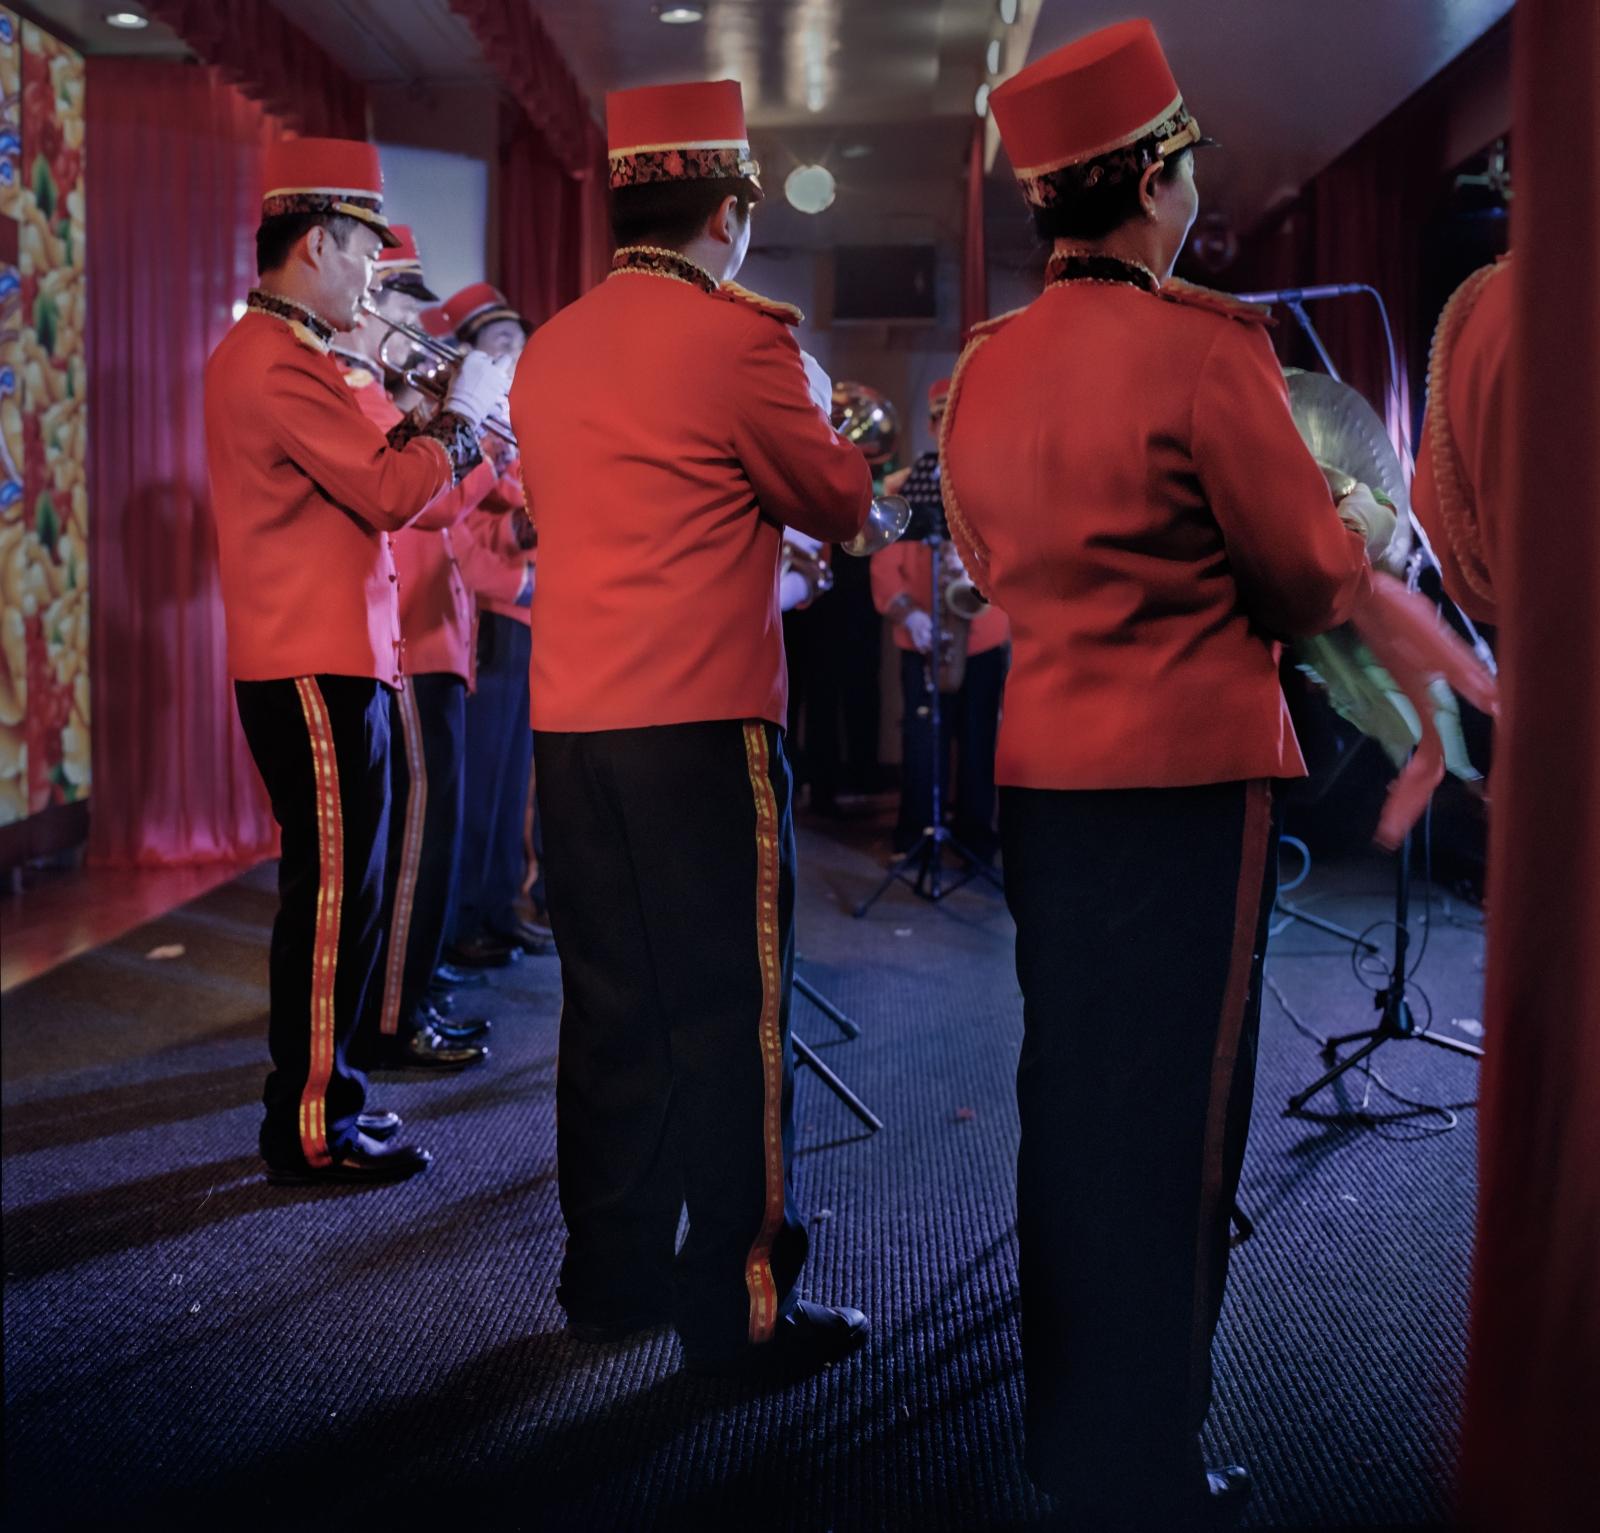 Hua Sheng Band performs at Chinese Community Center, New York City 华声乐队,纽约中华会所